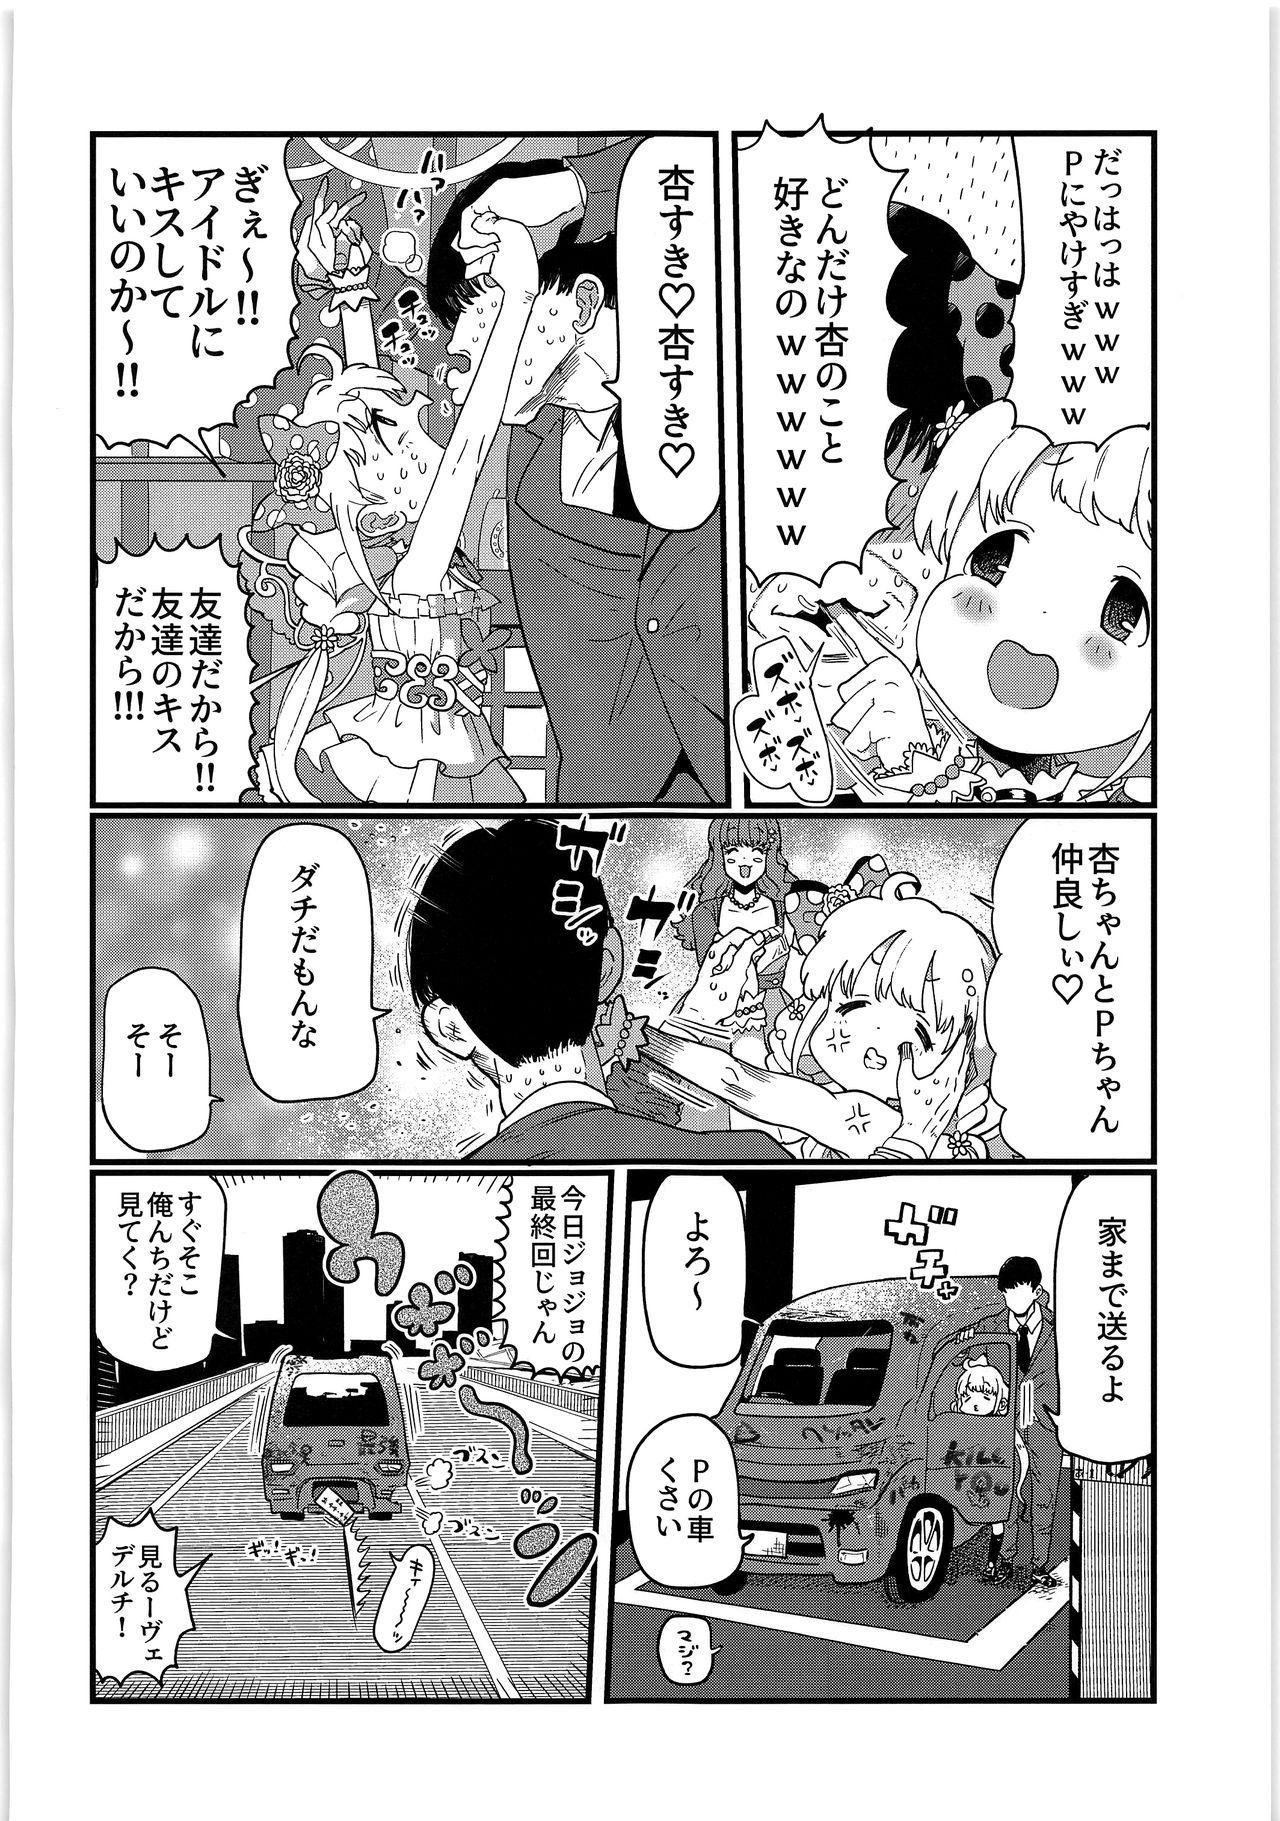 Anzu-chan wa Tomodachi 3